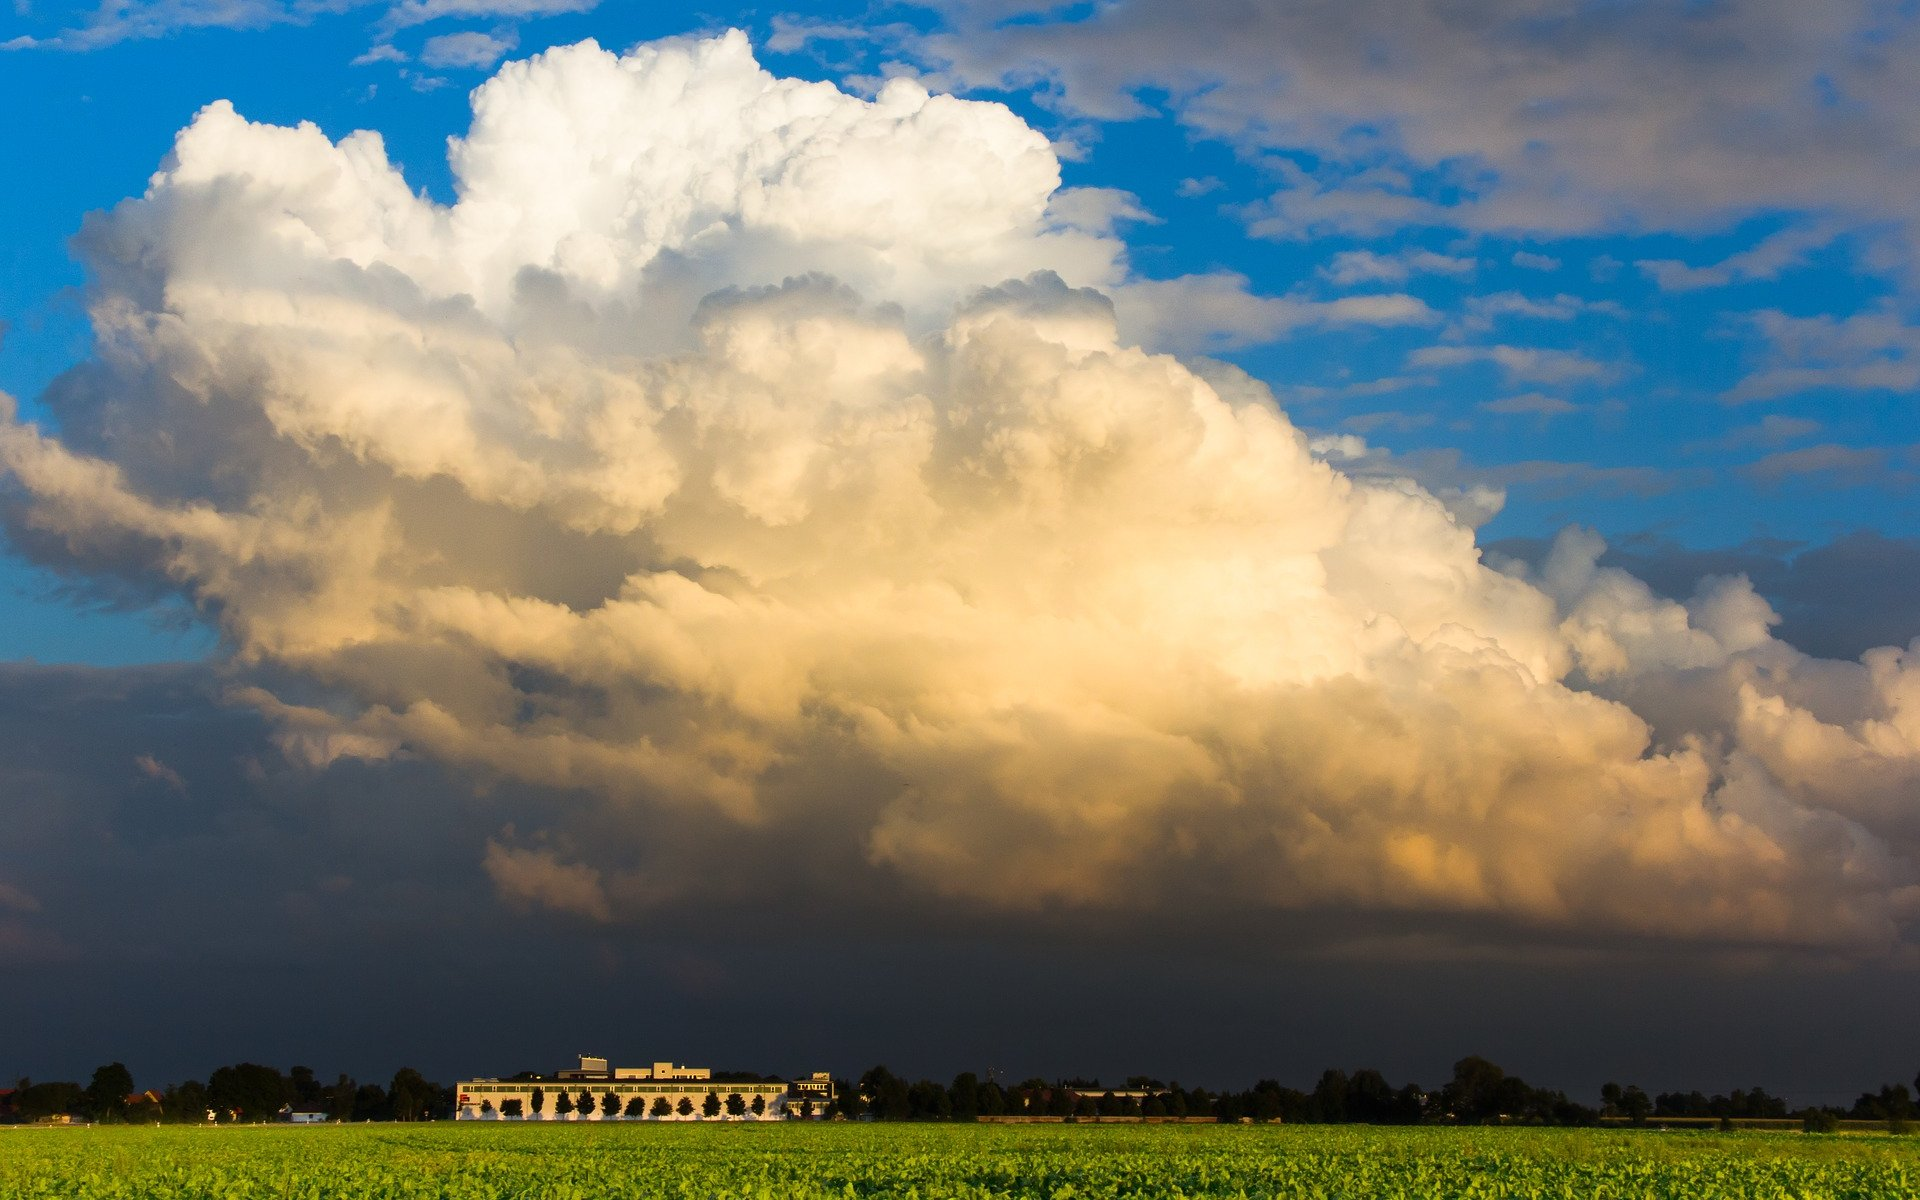 Cumuluswolke über dem Flachland. © pixabay.com